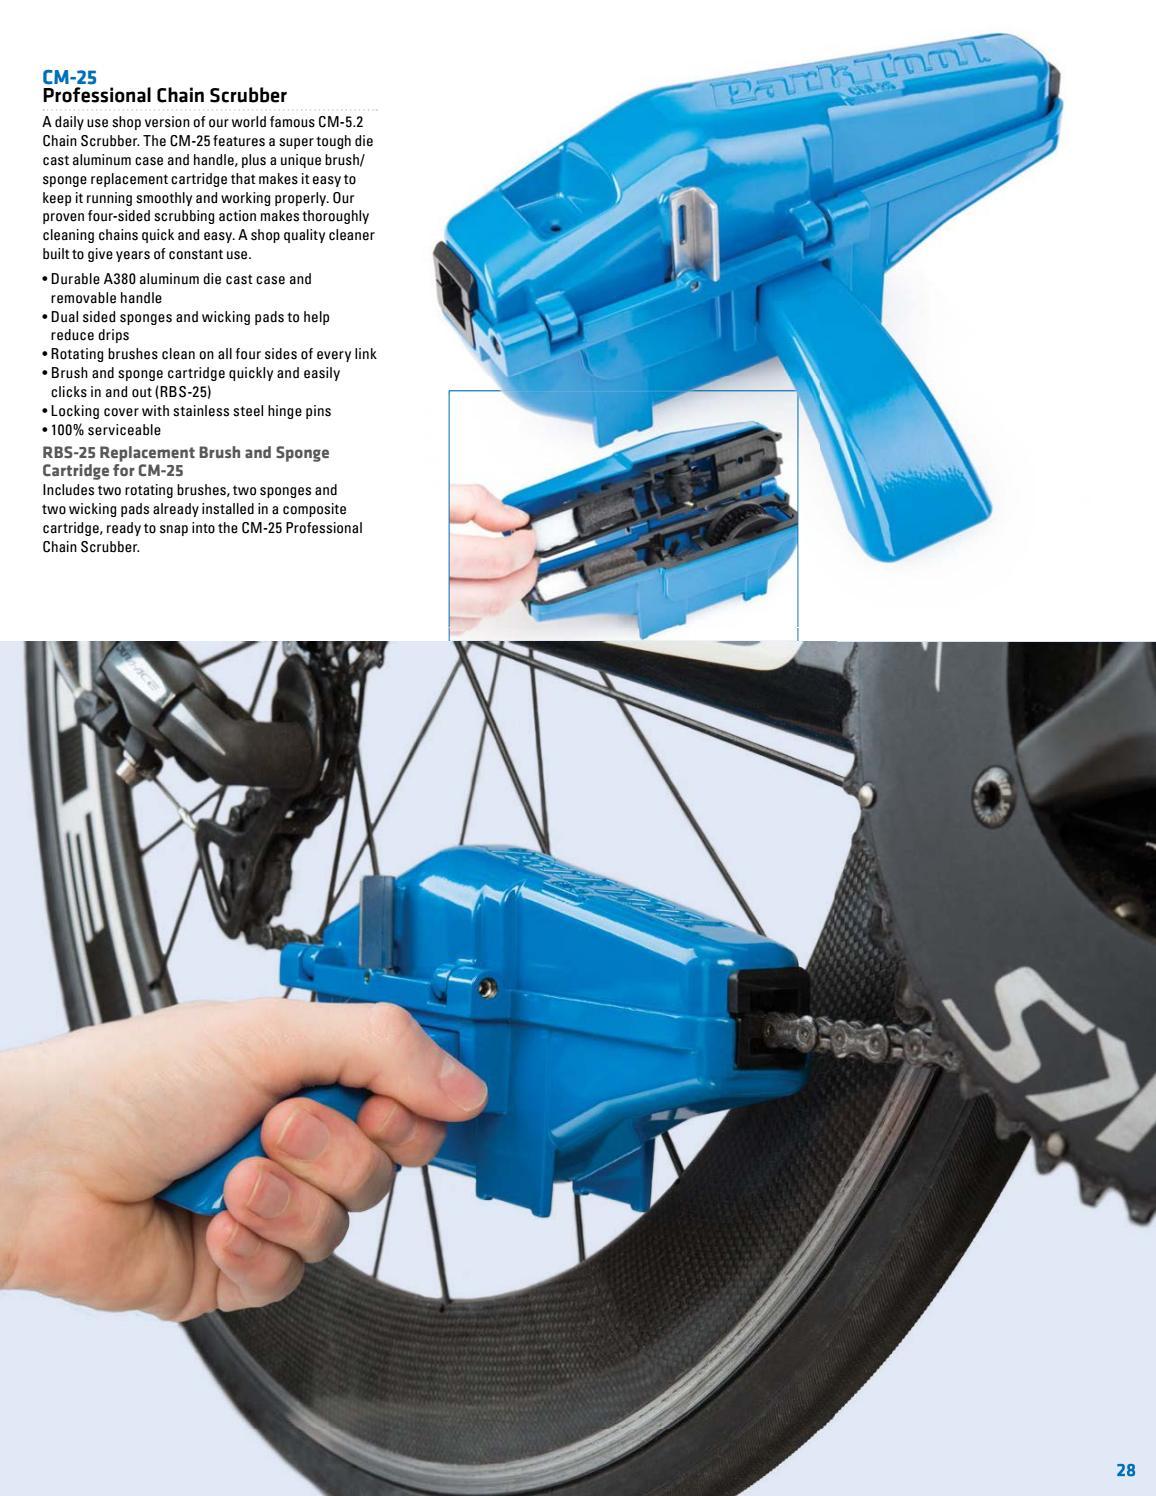 Park Tool CM-25 Replacement Brush and Sponge Cartridge